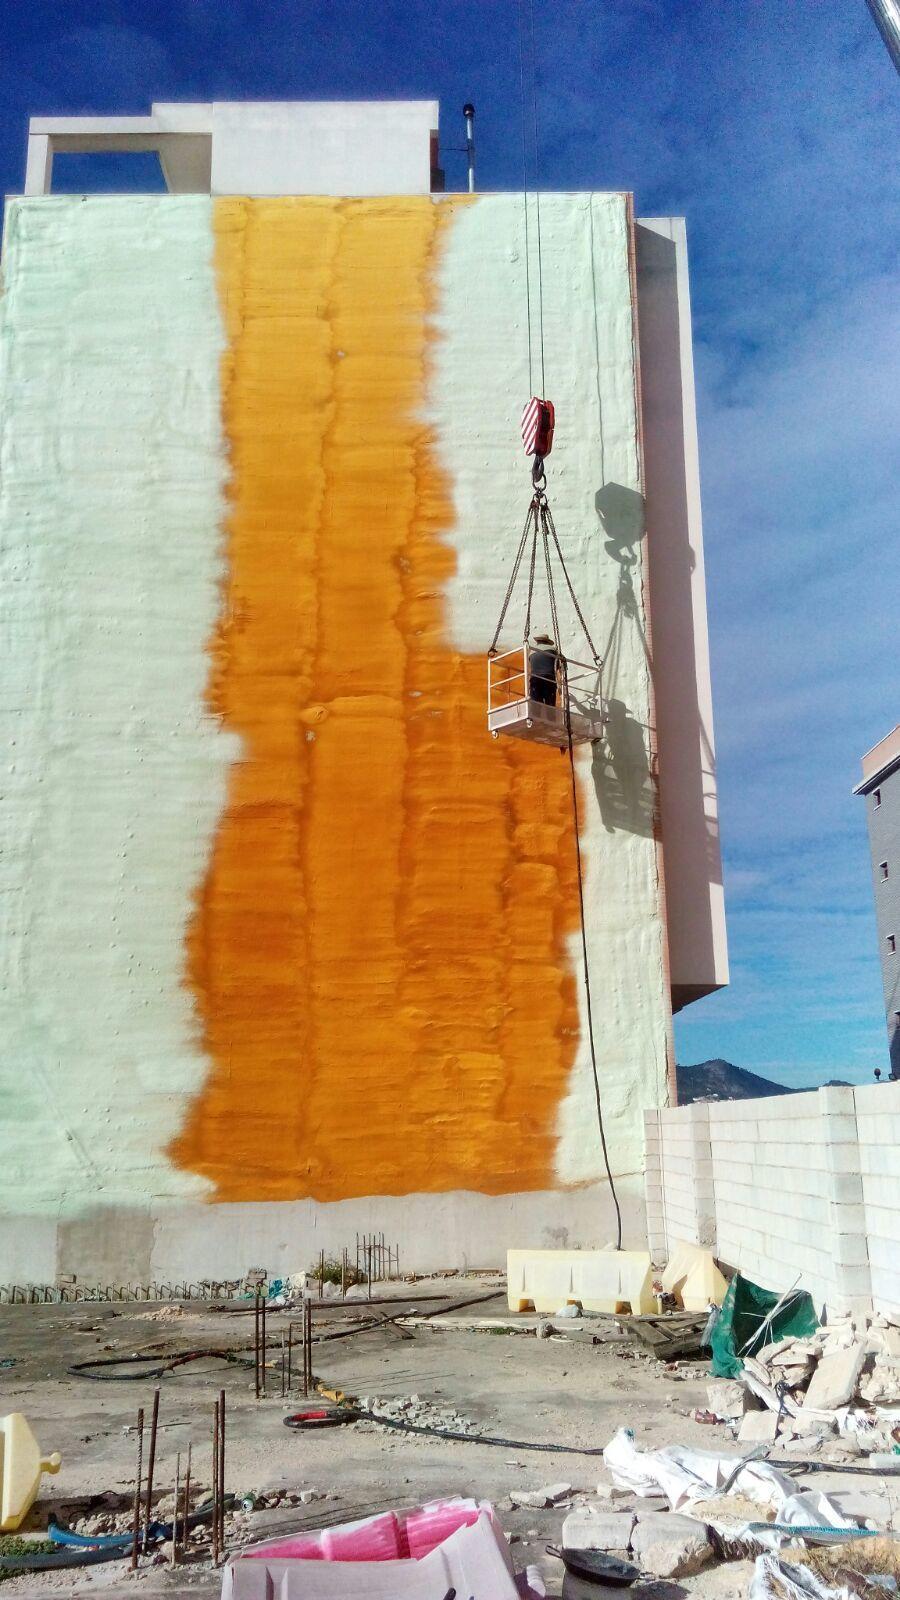 Foto 27 de Aislamientos acústicos y térmicos en Rafelcofer | Aislamientos de Poliuretano Jaime Femenia